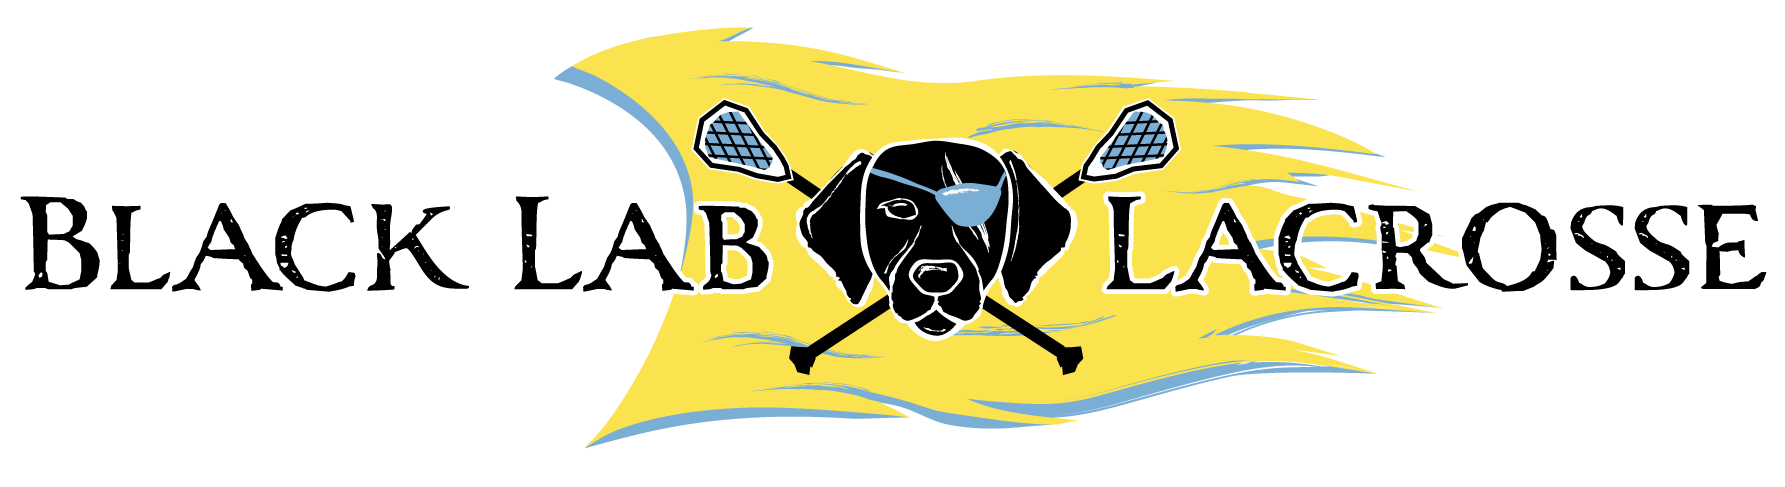 Hunting clipart black lab. Lacrosse